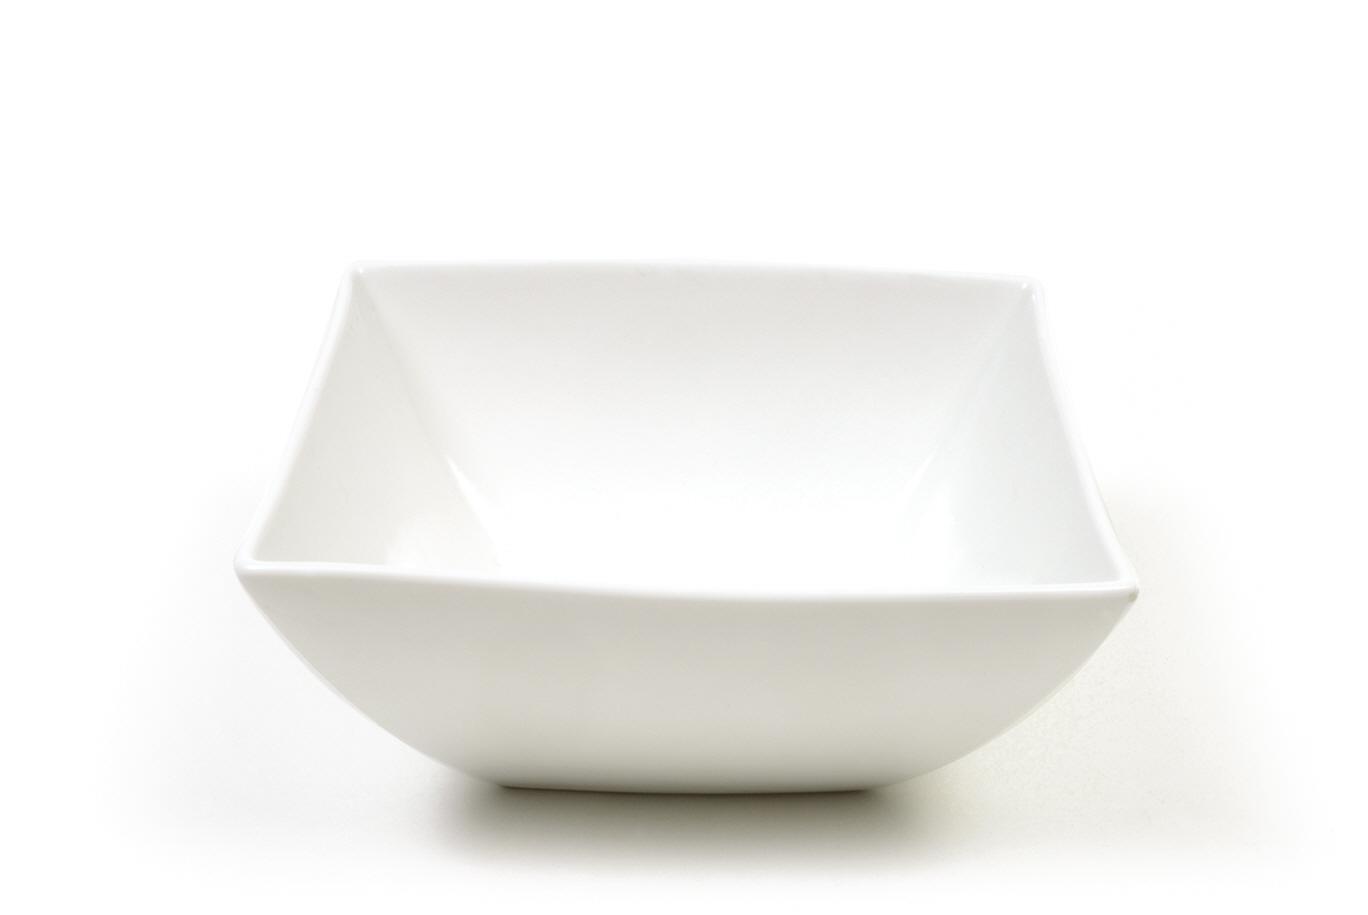 Čtvercová polévková miska East Meets West 18 x 18 cm - Maxwell&Williams